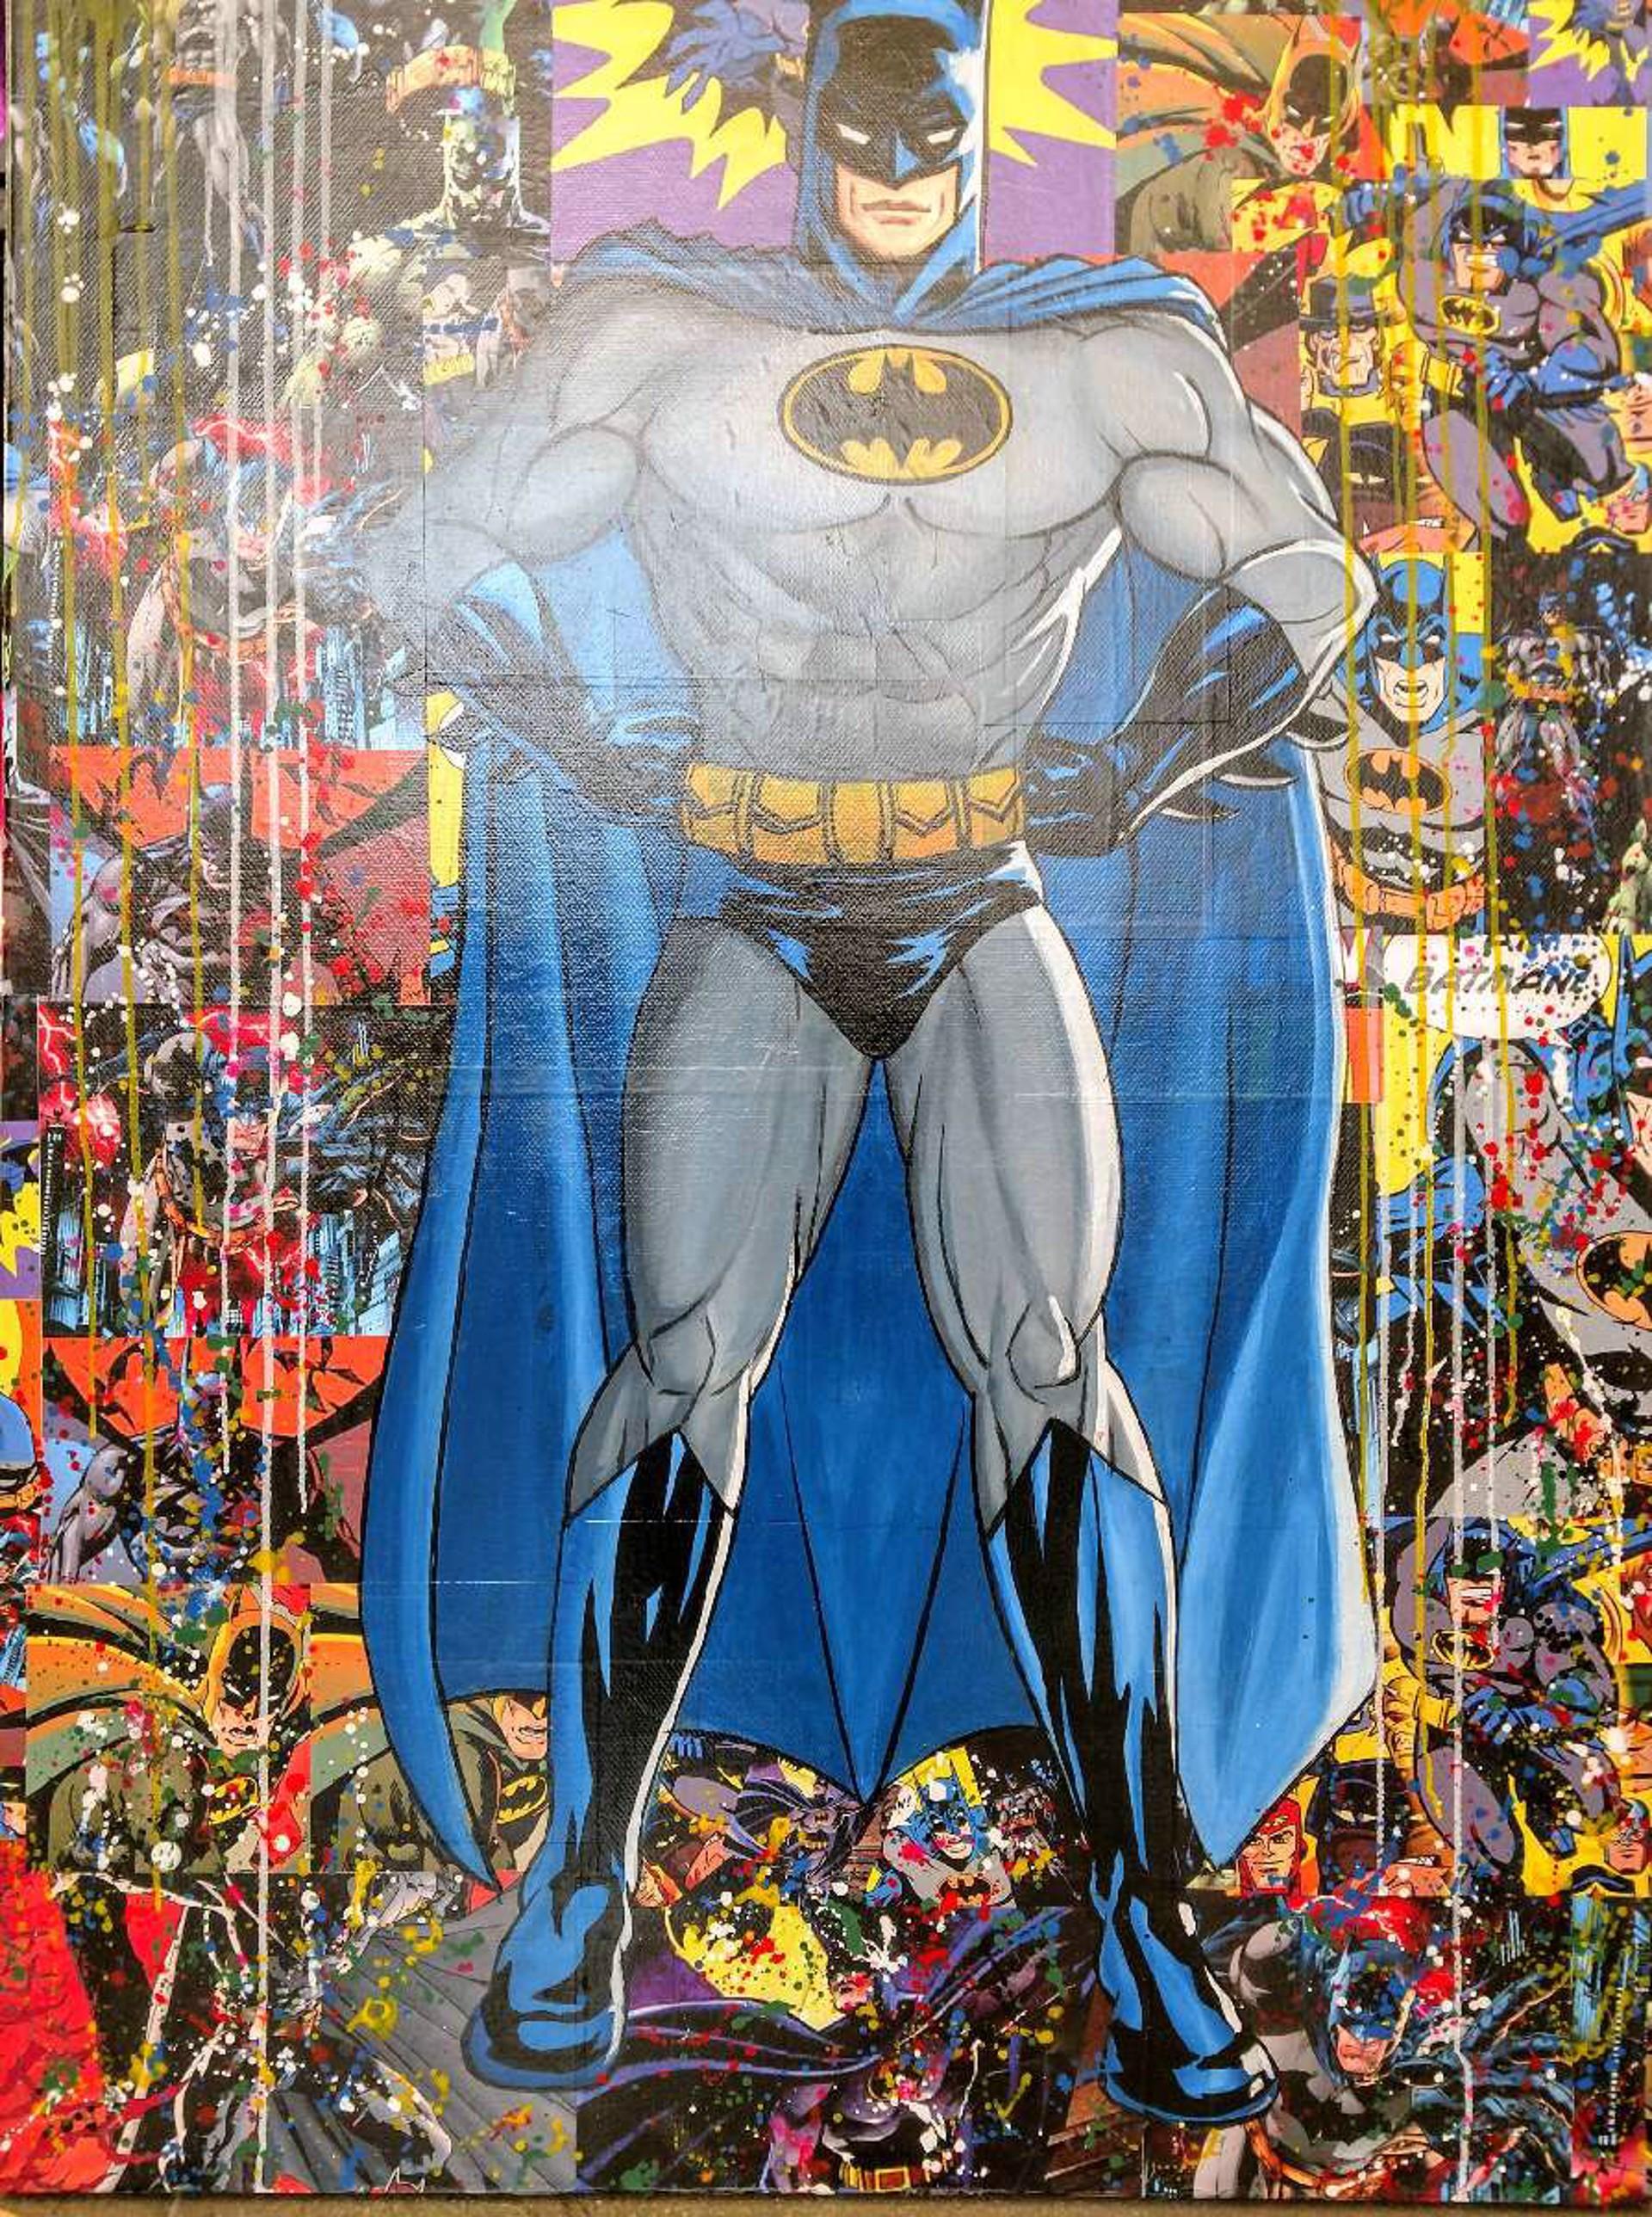 Batman by Buma Project